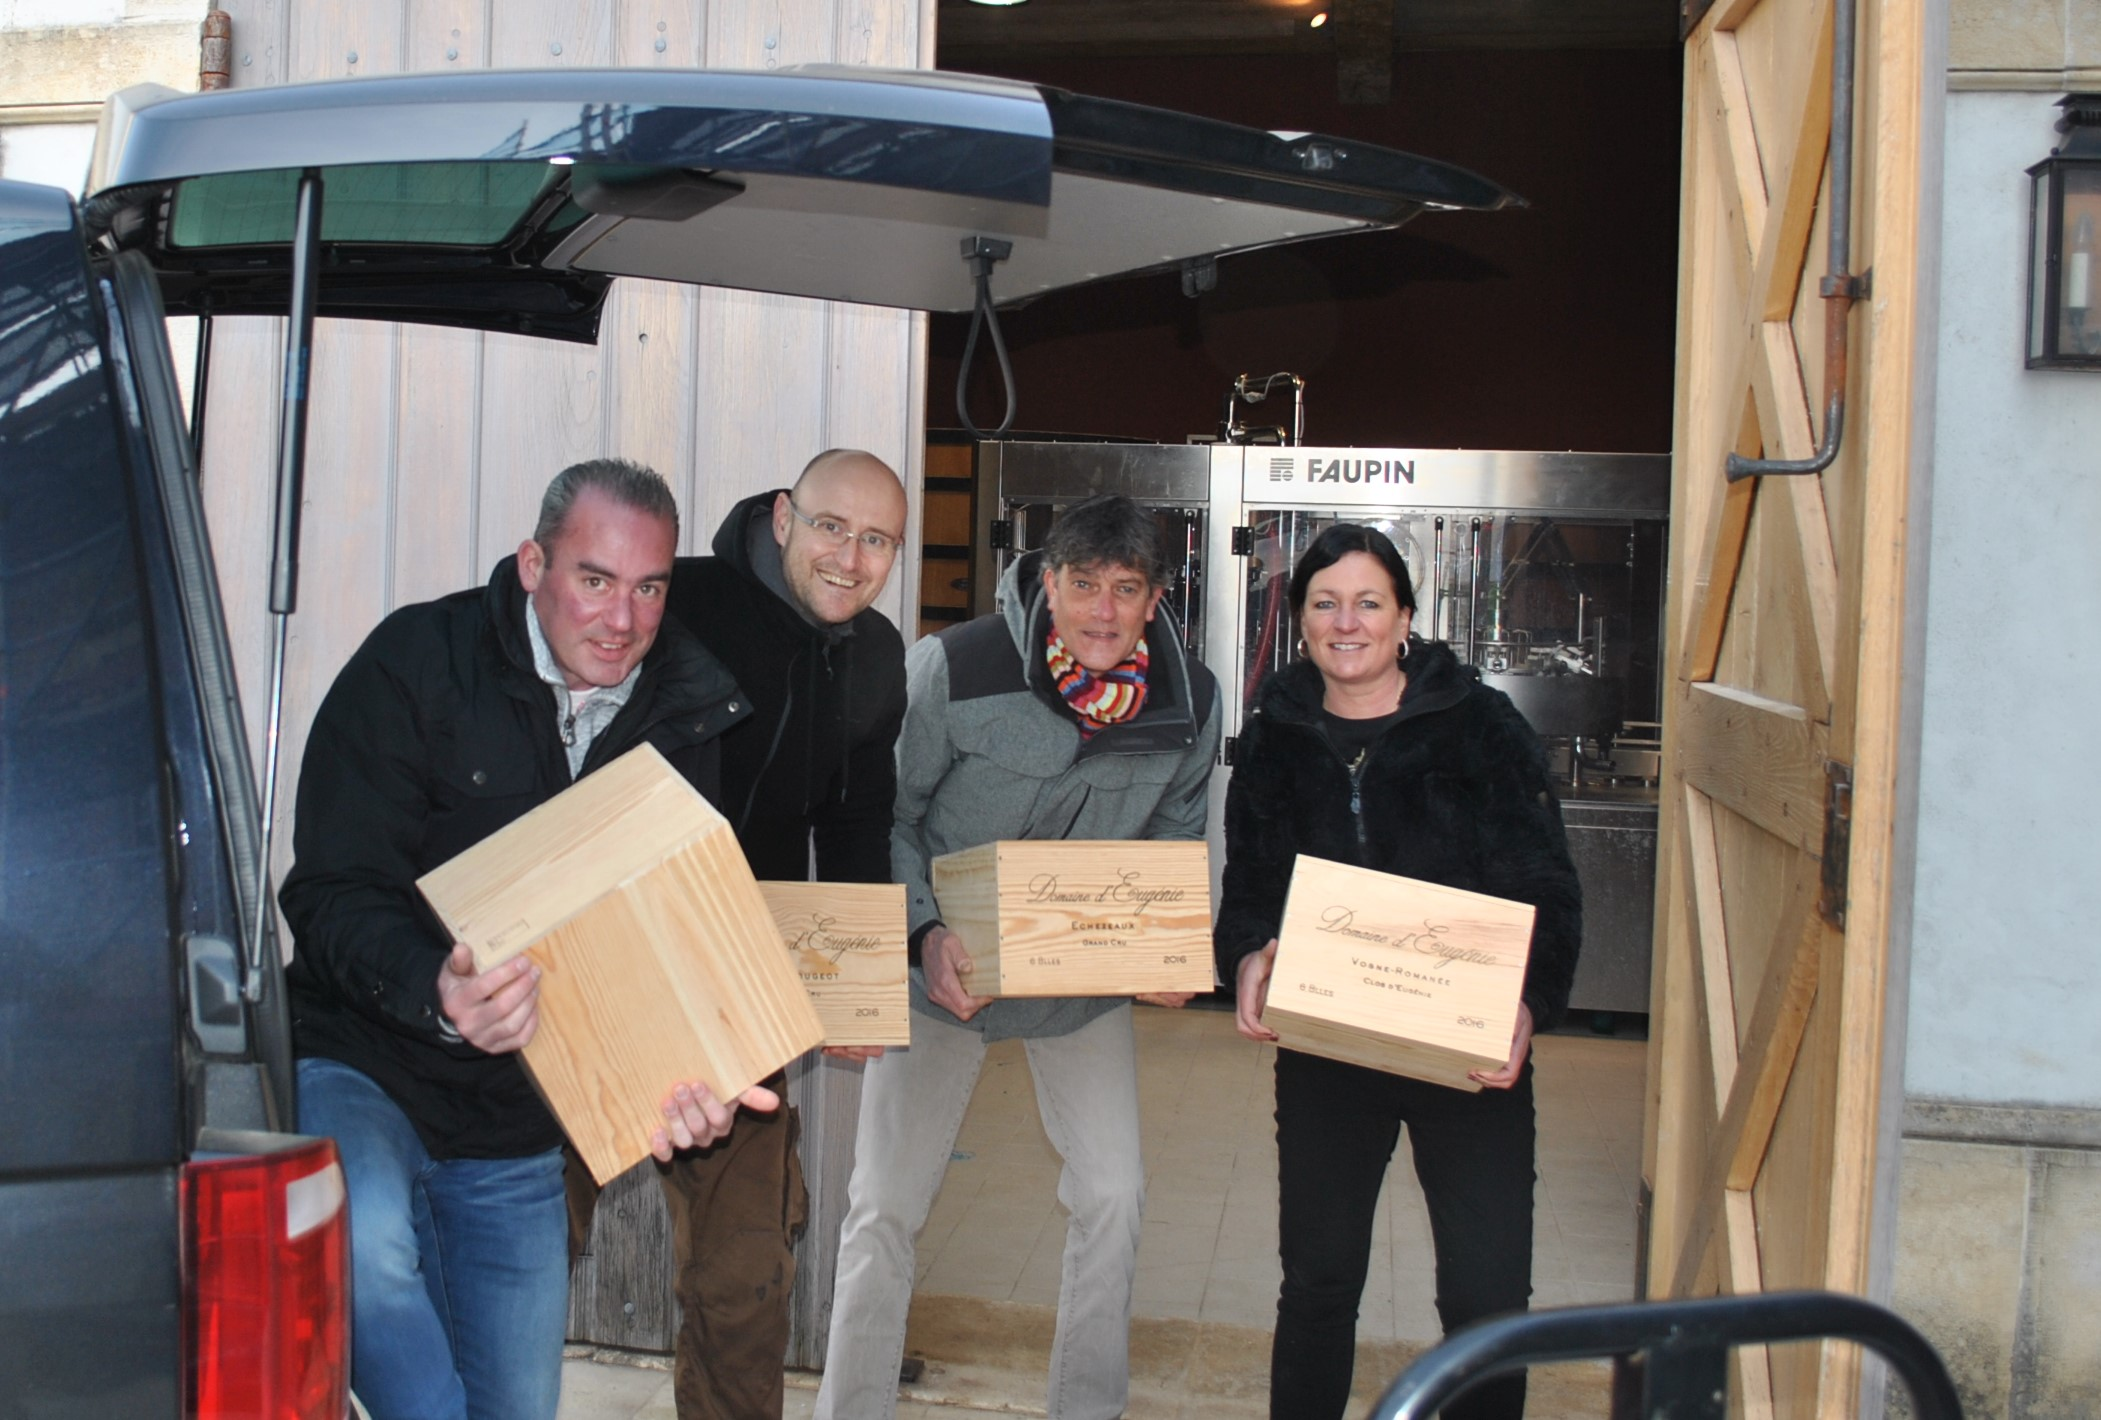 Kisten sjouwen bij Domaine Eugenie in Vosne-Romanee